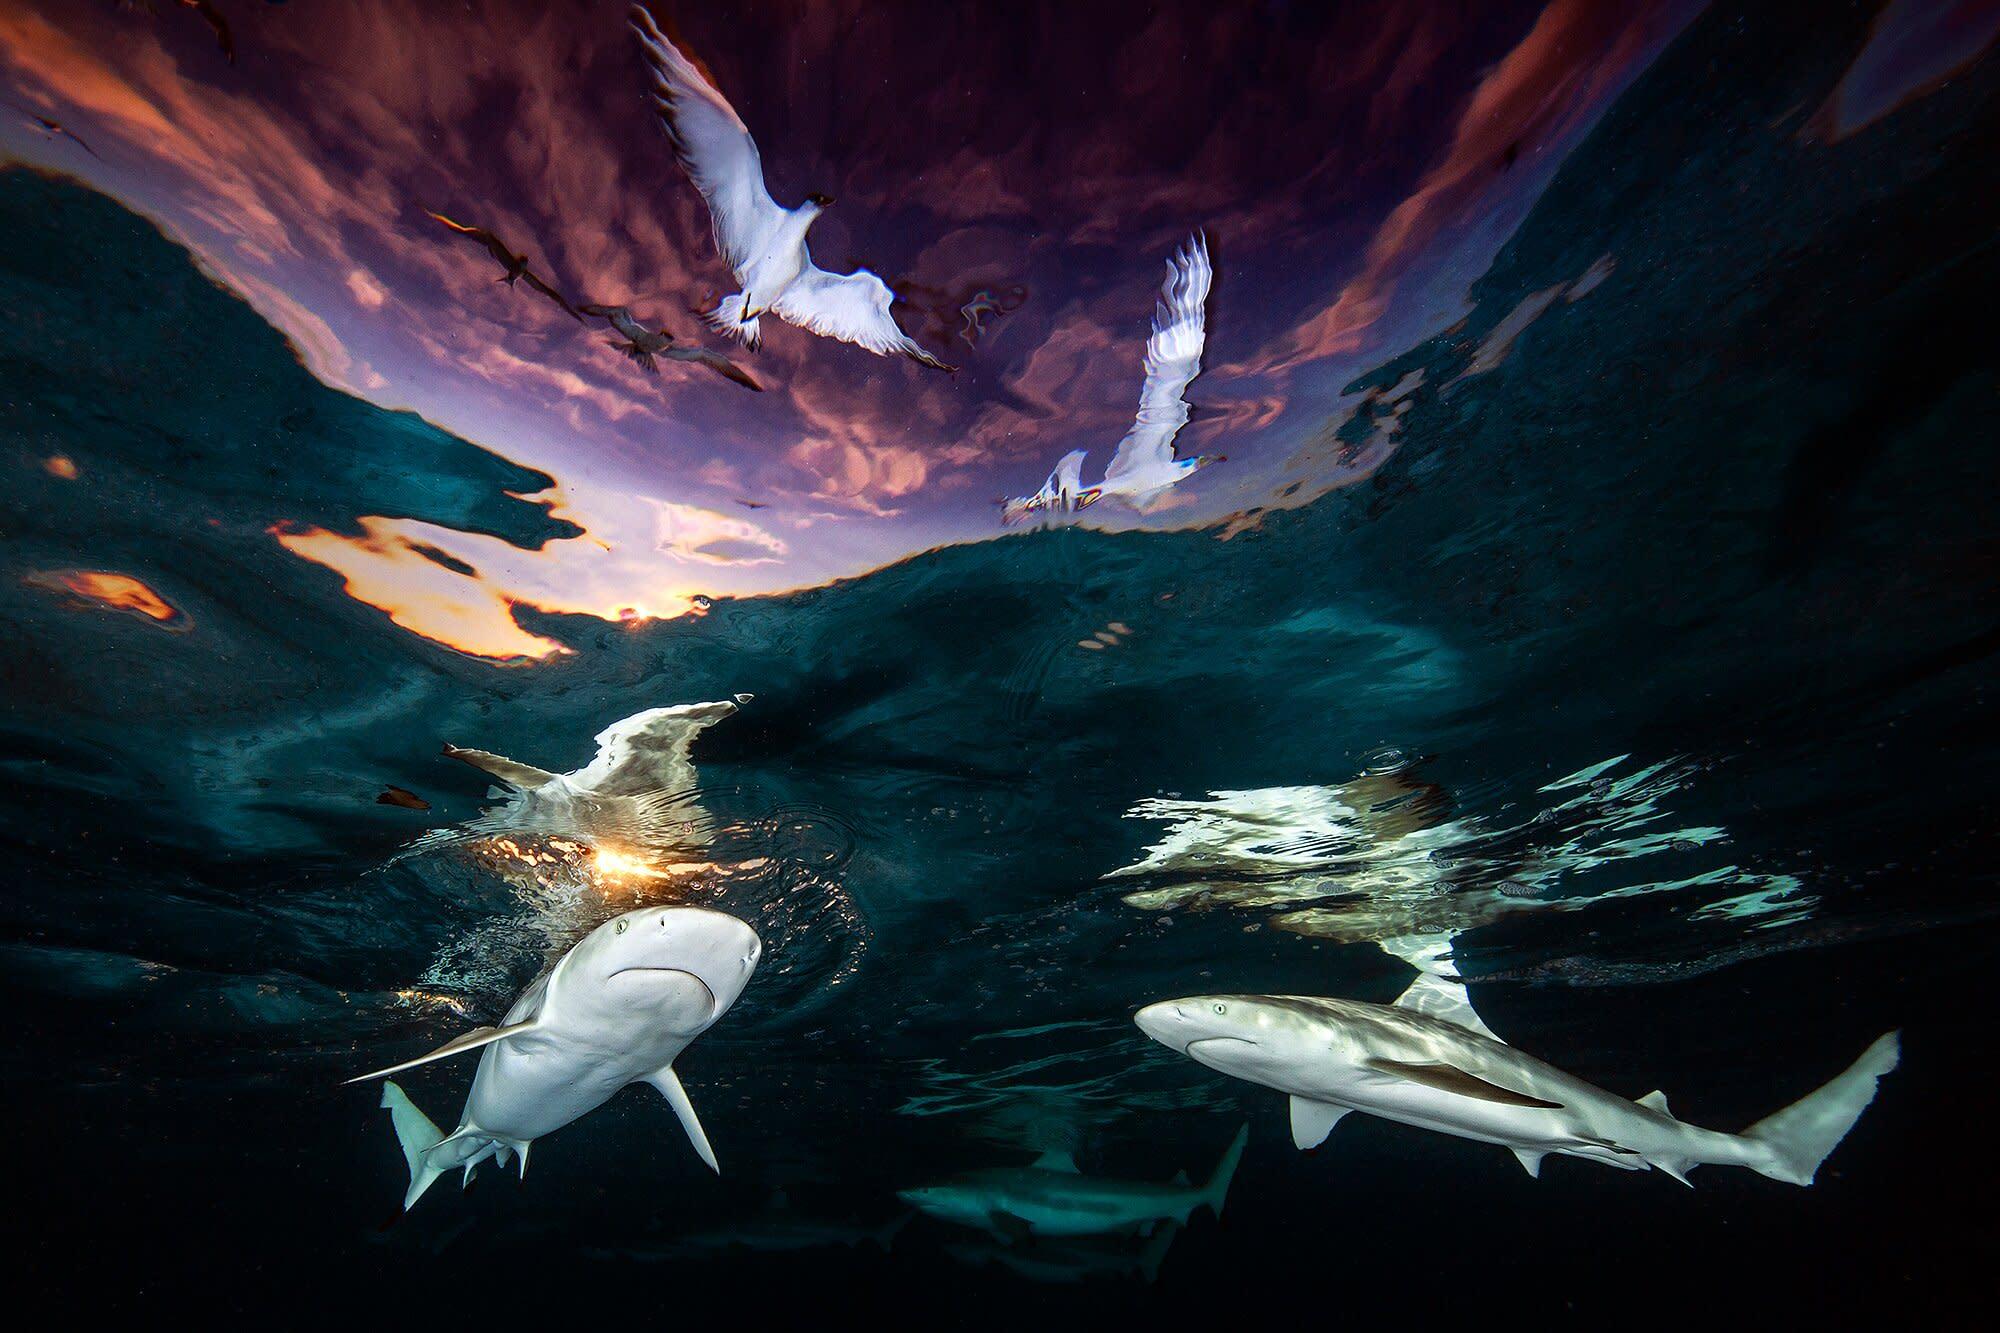 Paws underwater shark attack SweatShirt